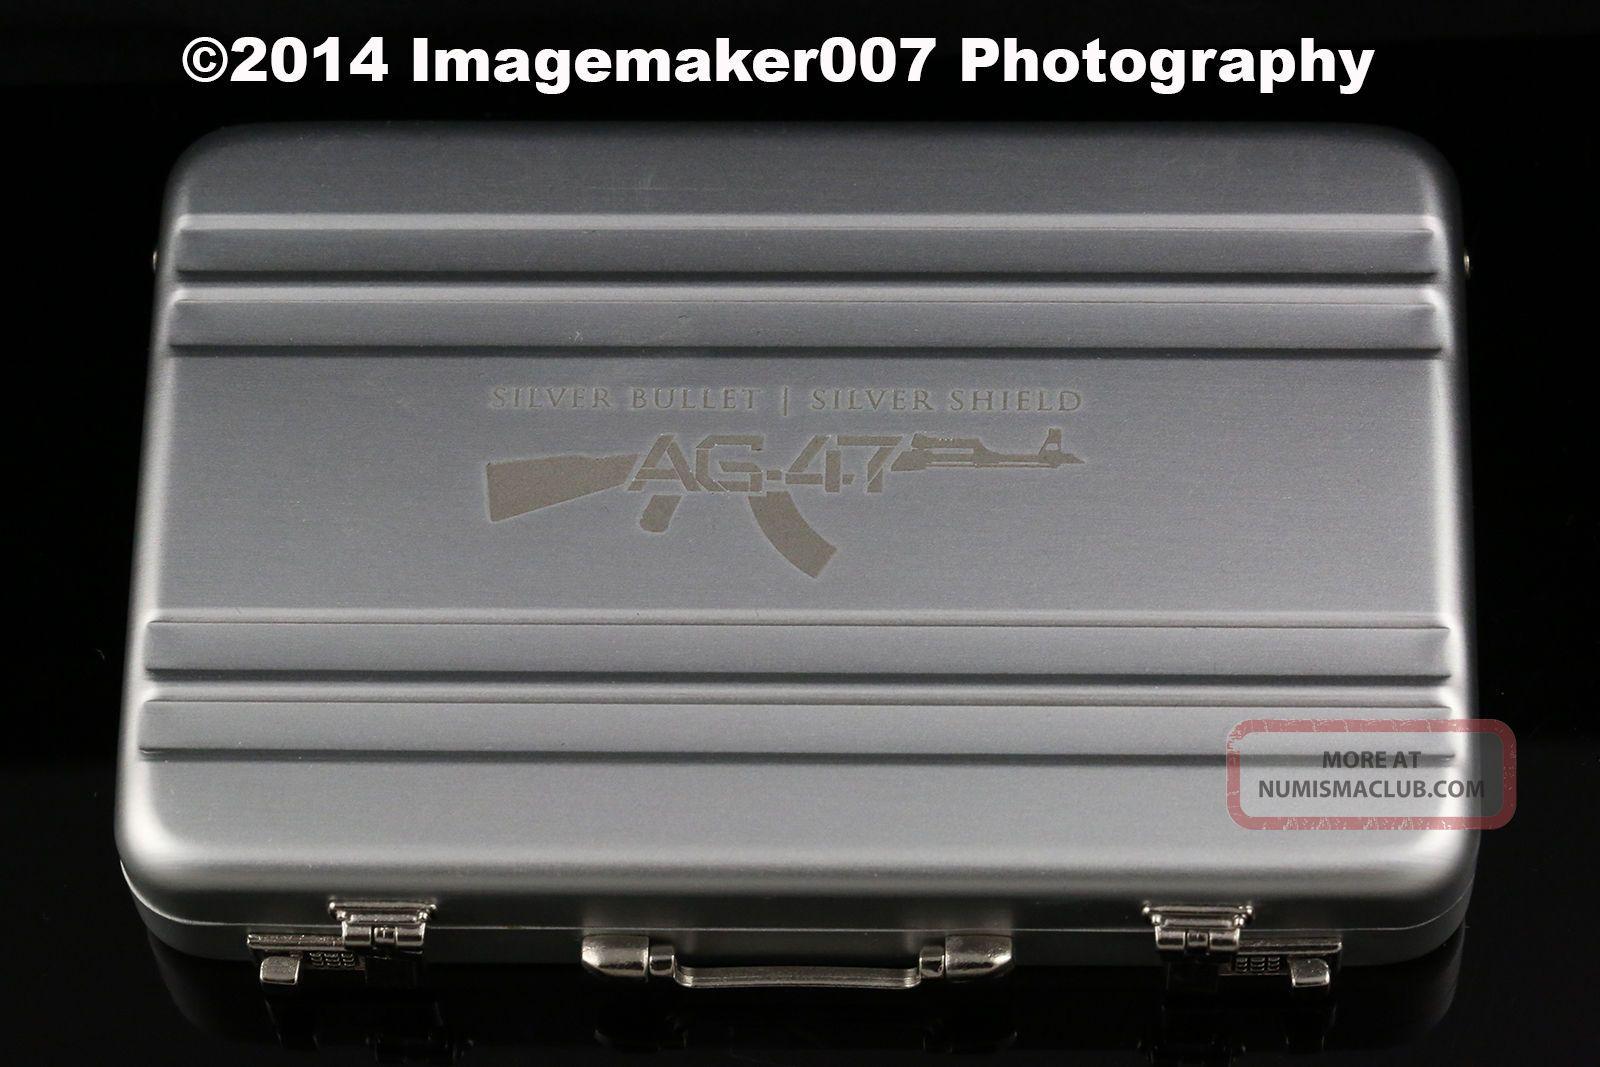 1oz Ag 47 999 Silver Proof W Original Gun Case Sbss